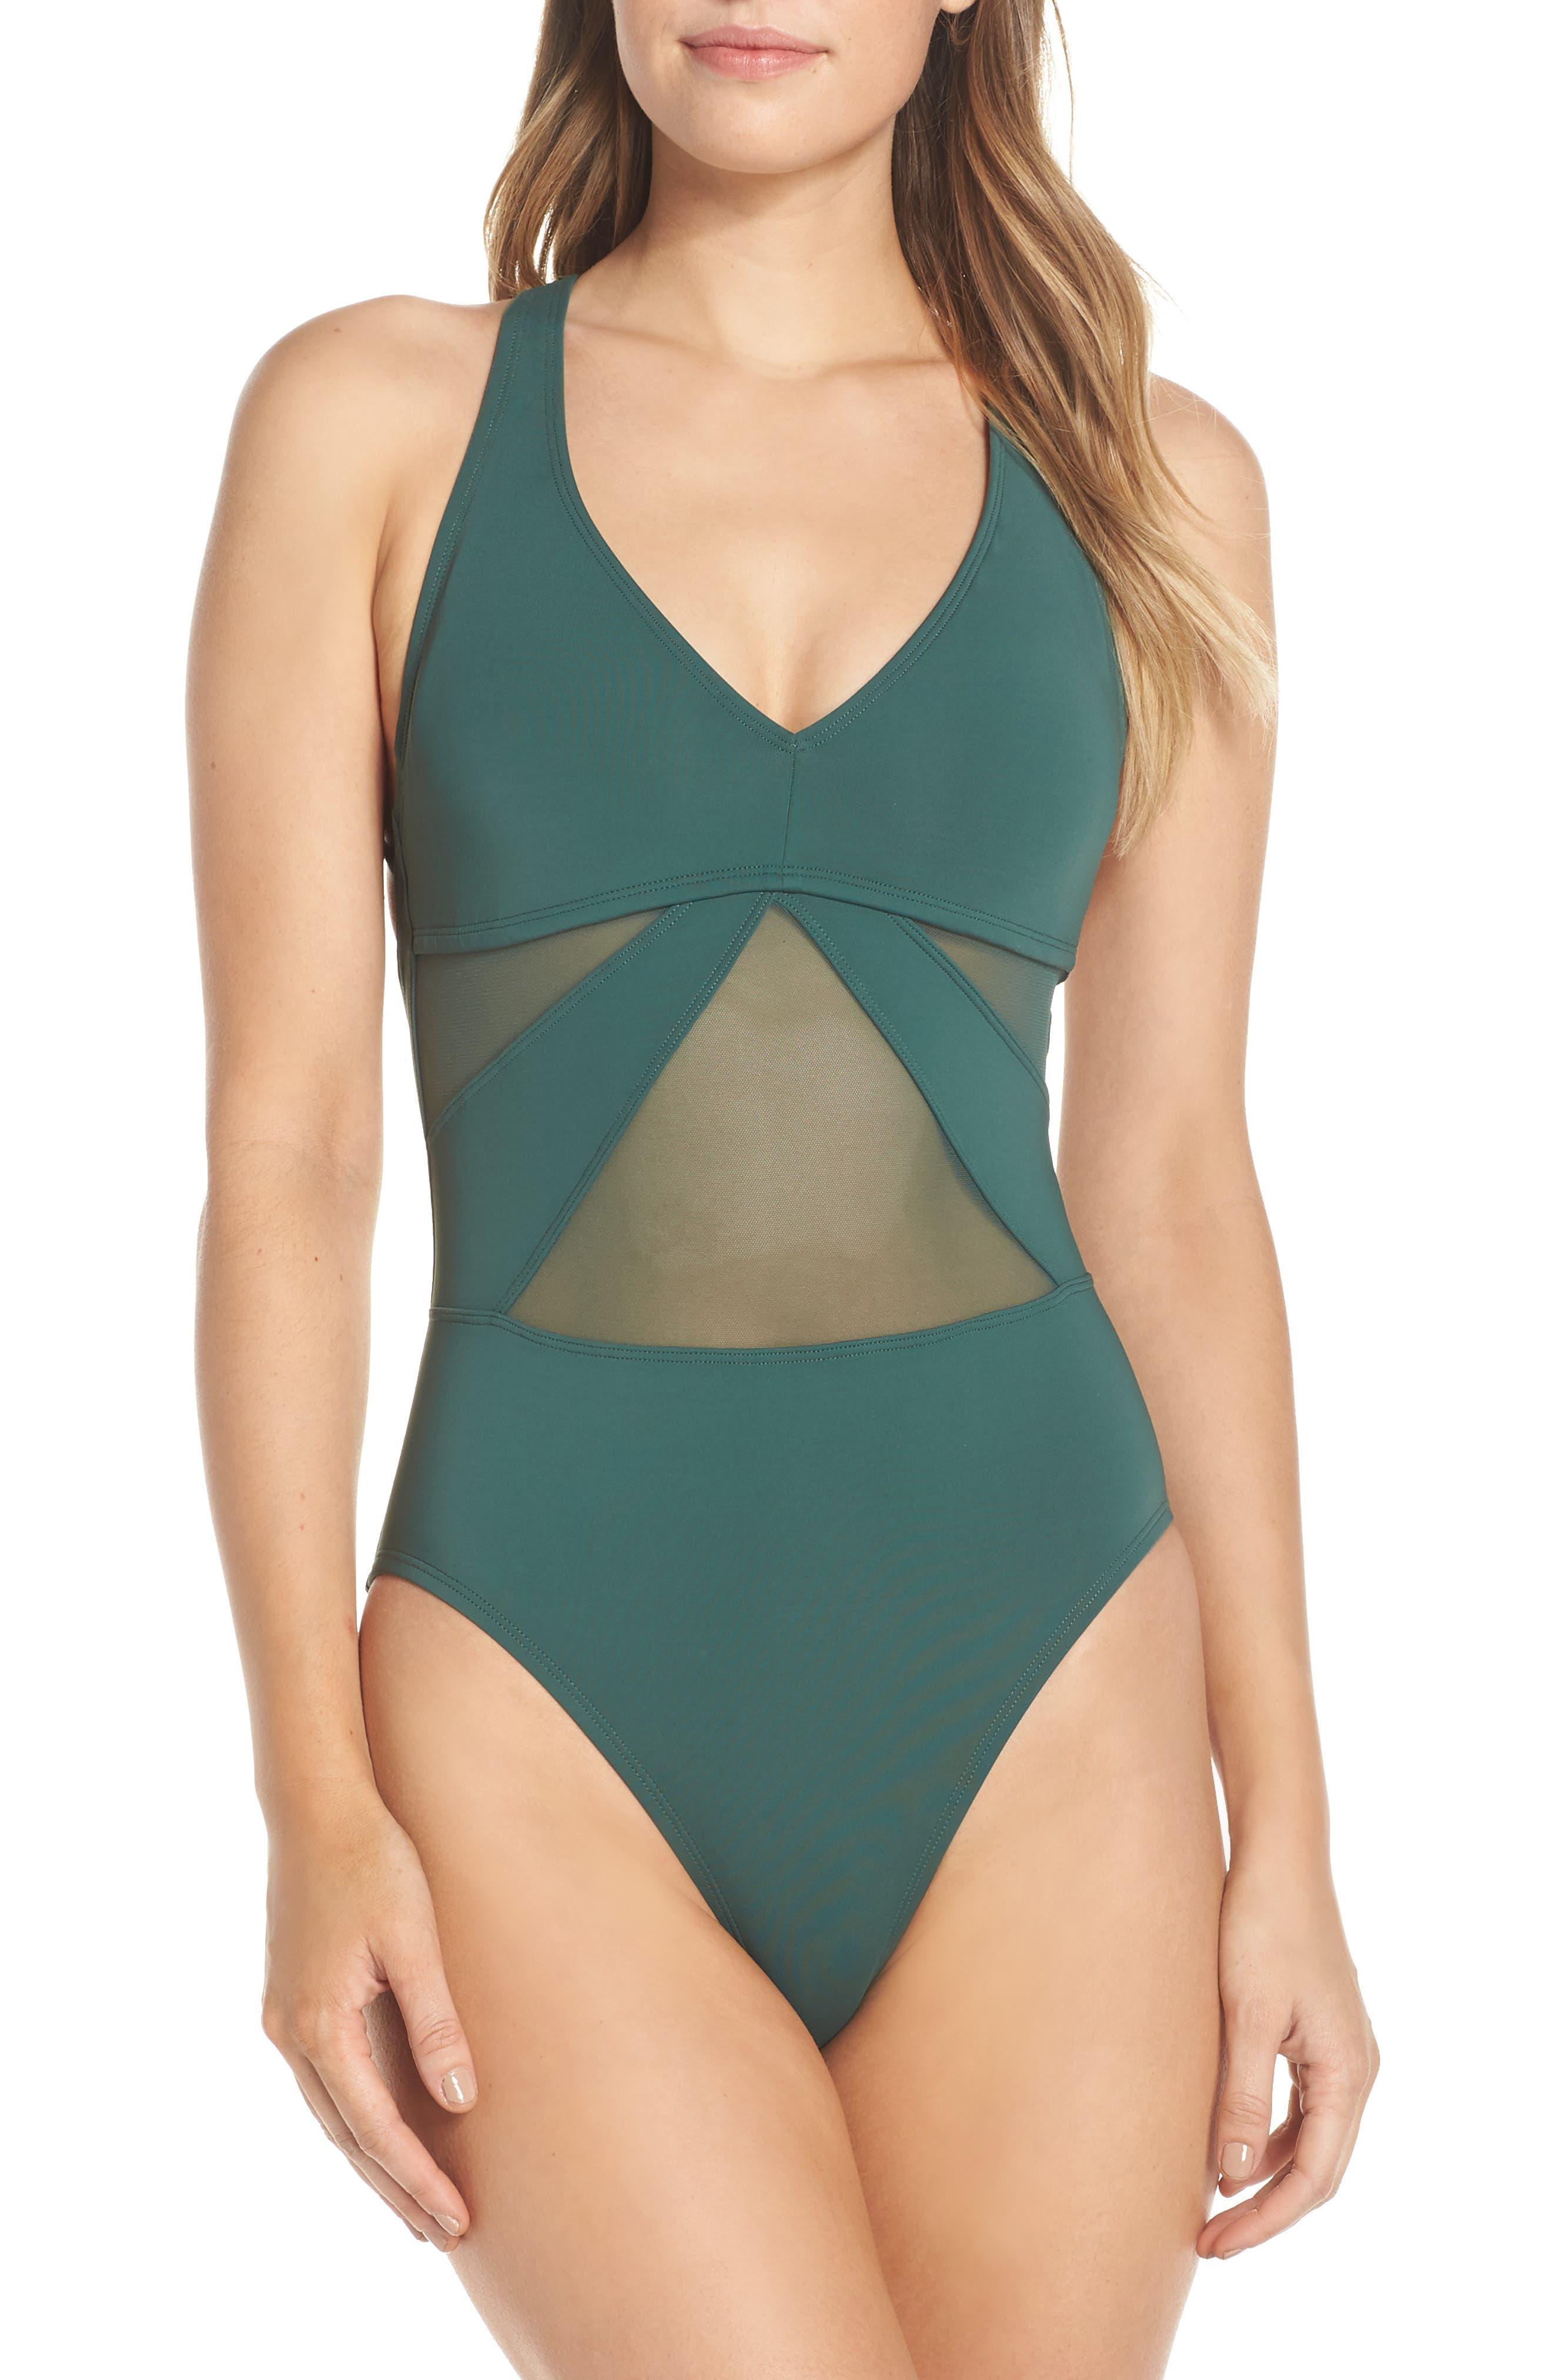 BLEU BY ROD BEATTIE Strappy Back One-Piece Swimsuit, Main, color, CAPE VERDE